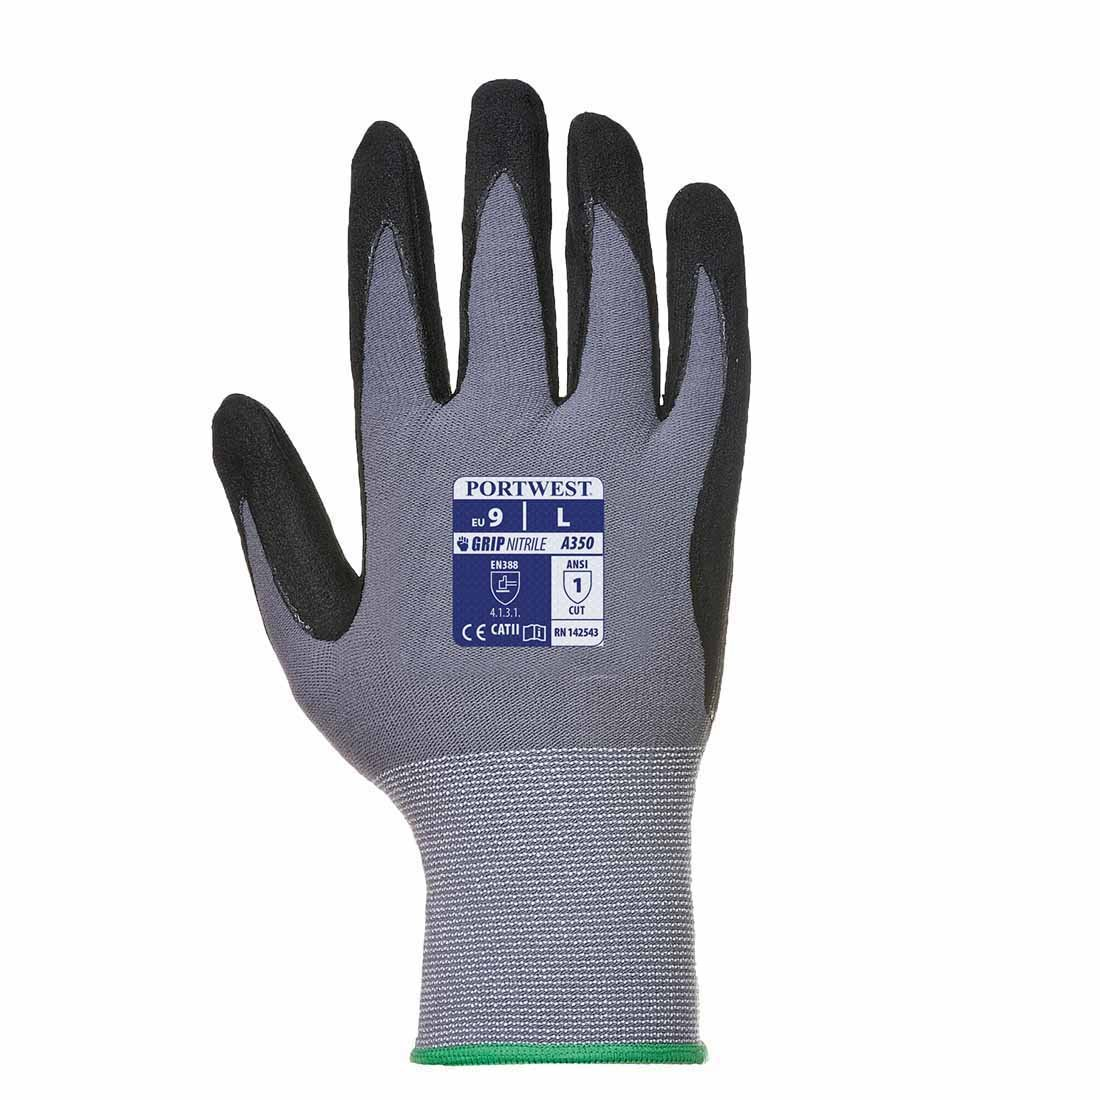 Black Small 1 Pair Pack DermiFlex General Handling Glove Portwest